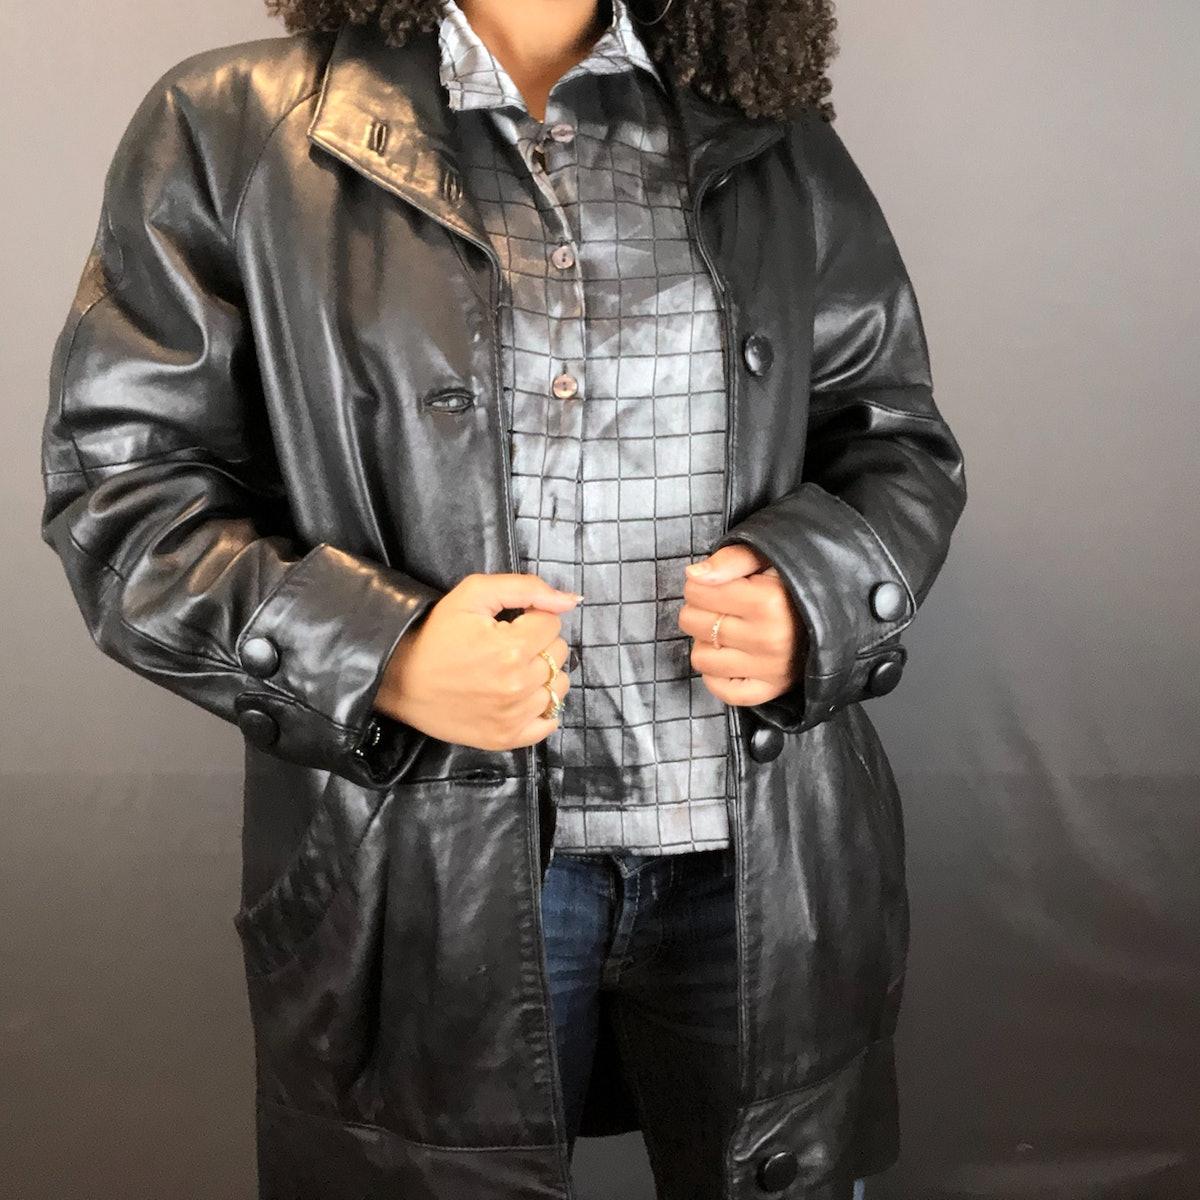 @sssumayaaa Retro Black Leather Trench Coat